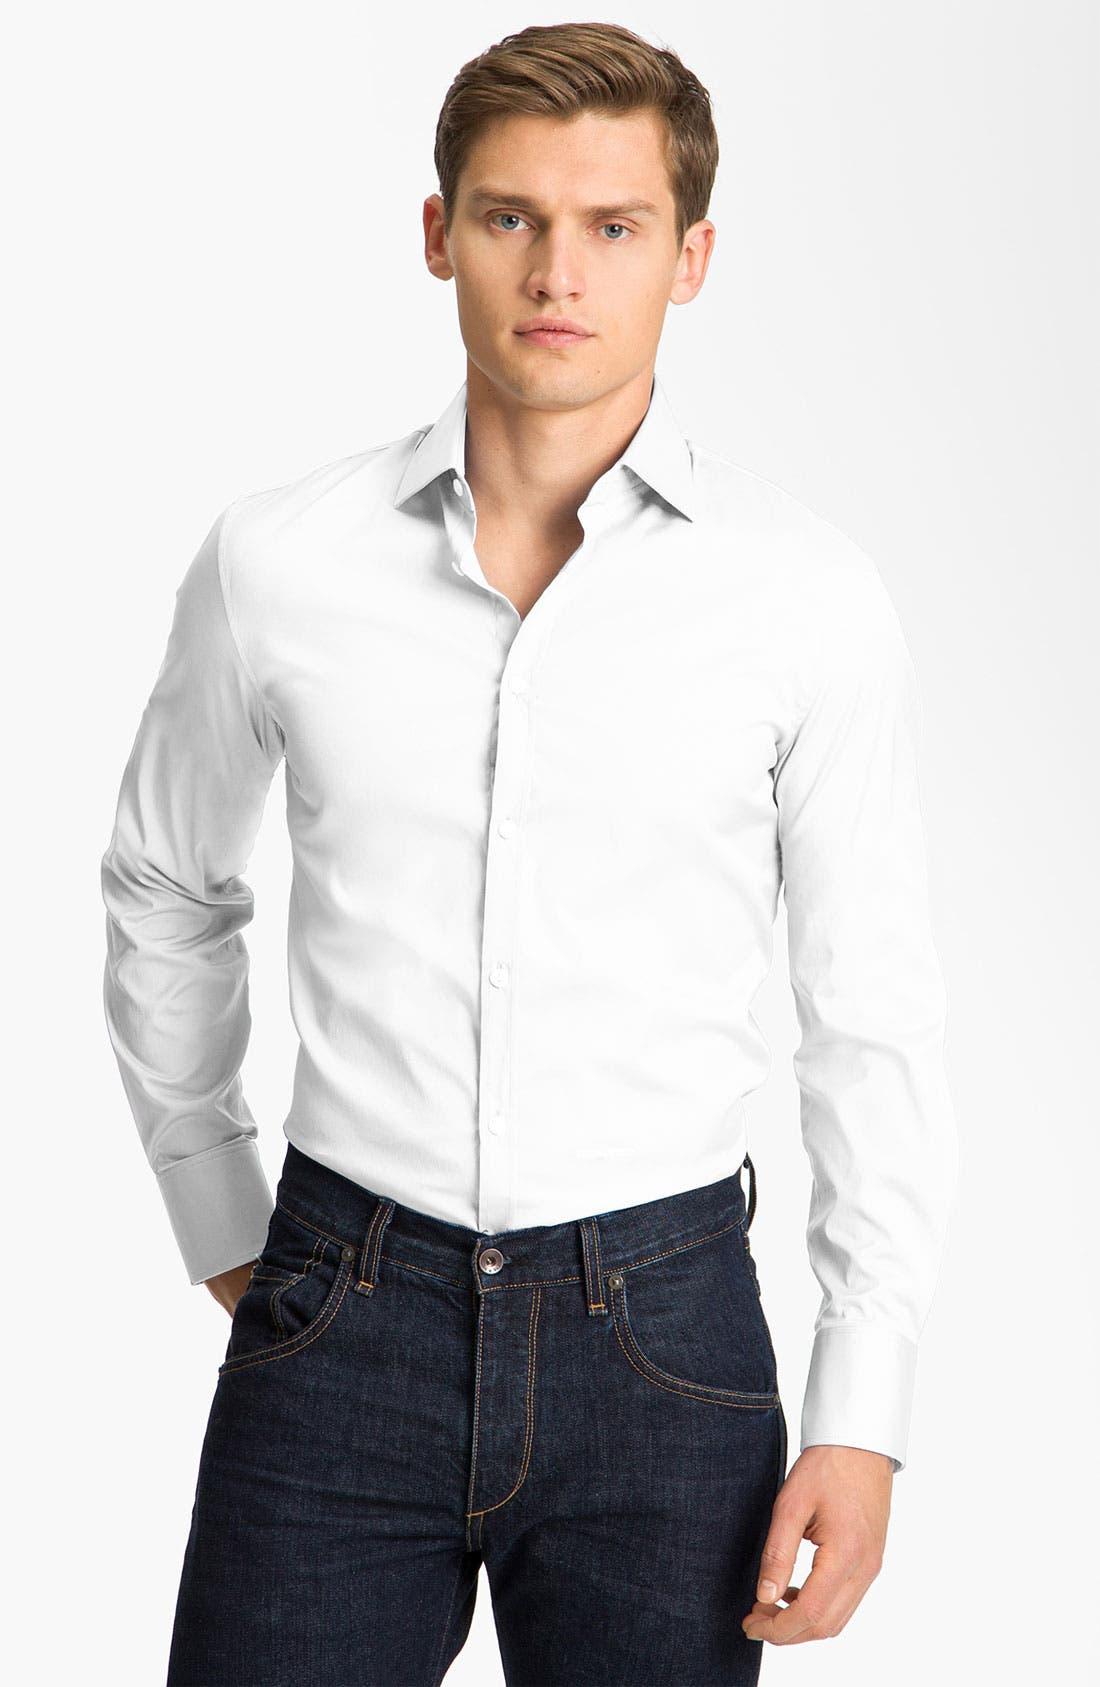 Alternate Image 1 Selected - Dsquared2 'Dean Dan' Stretch Cotton Dress Shirt